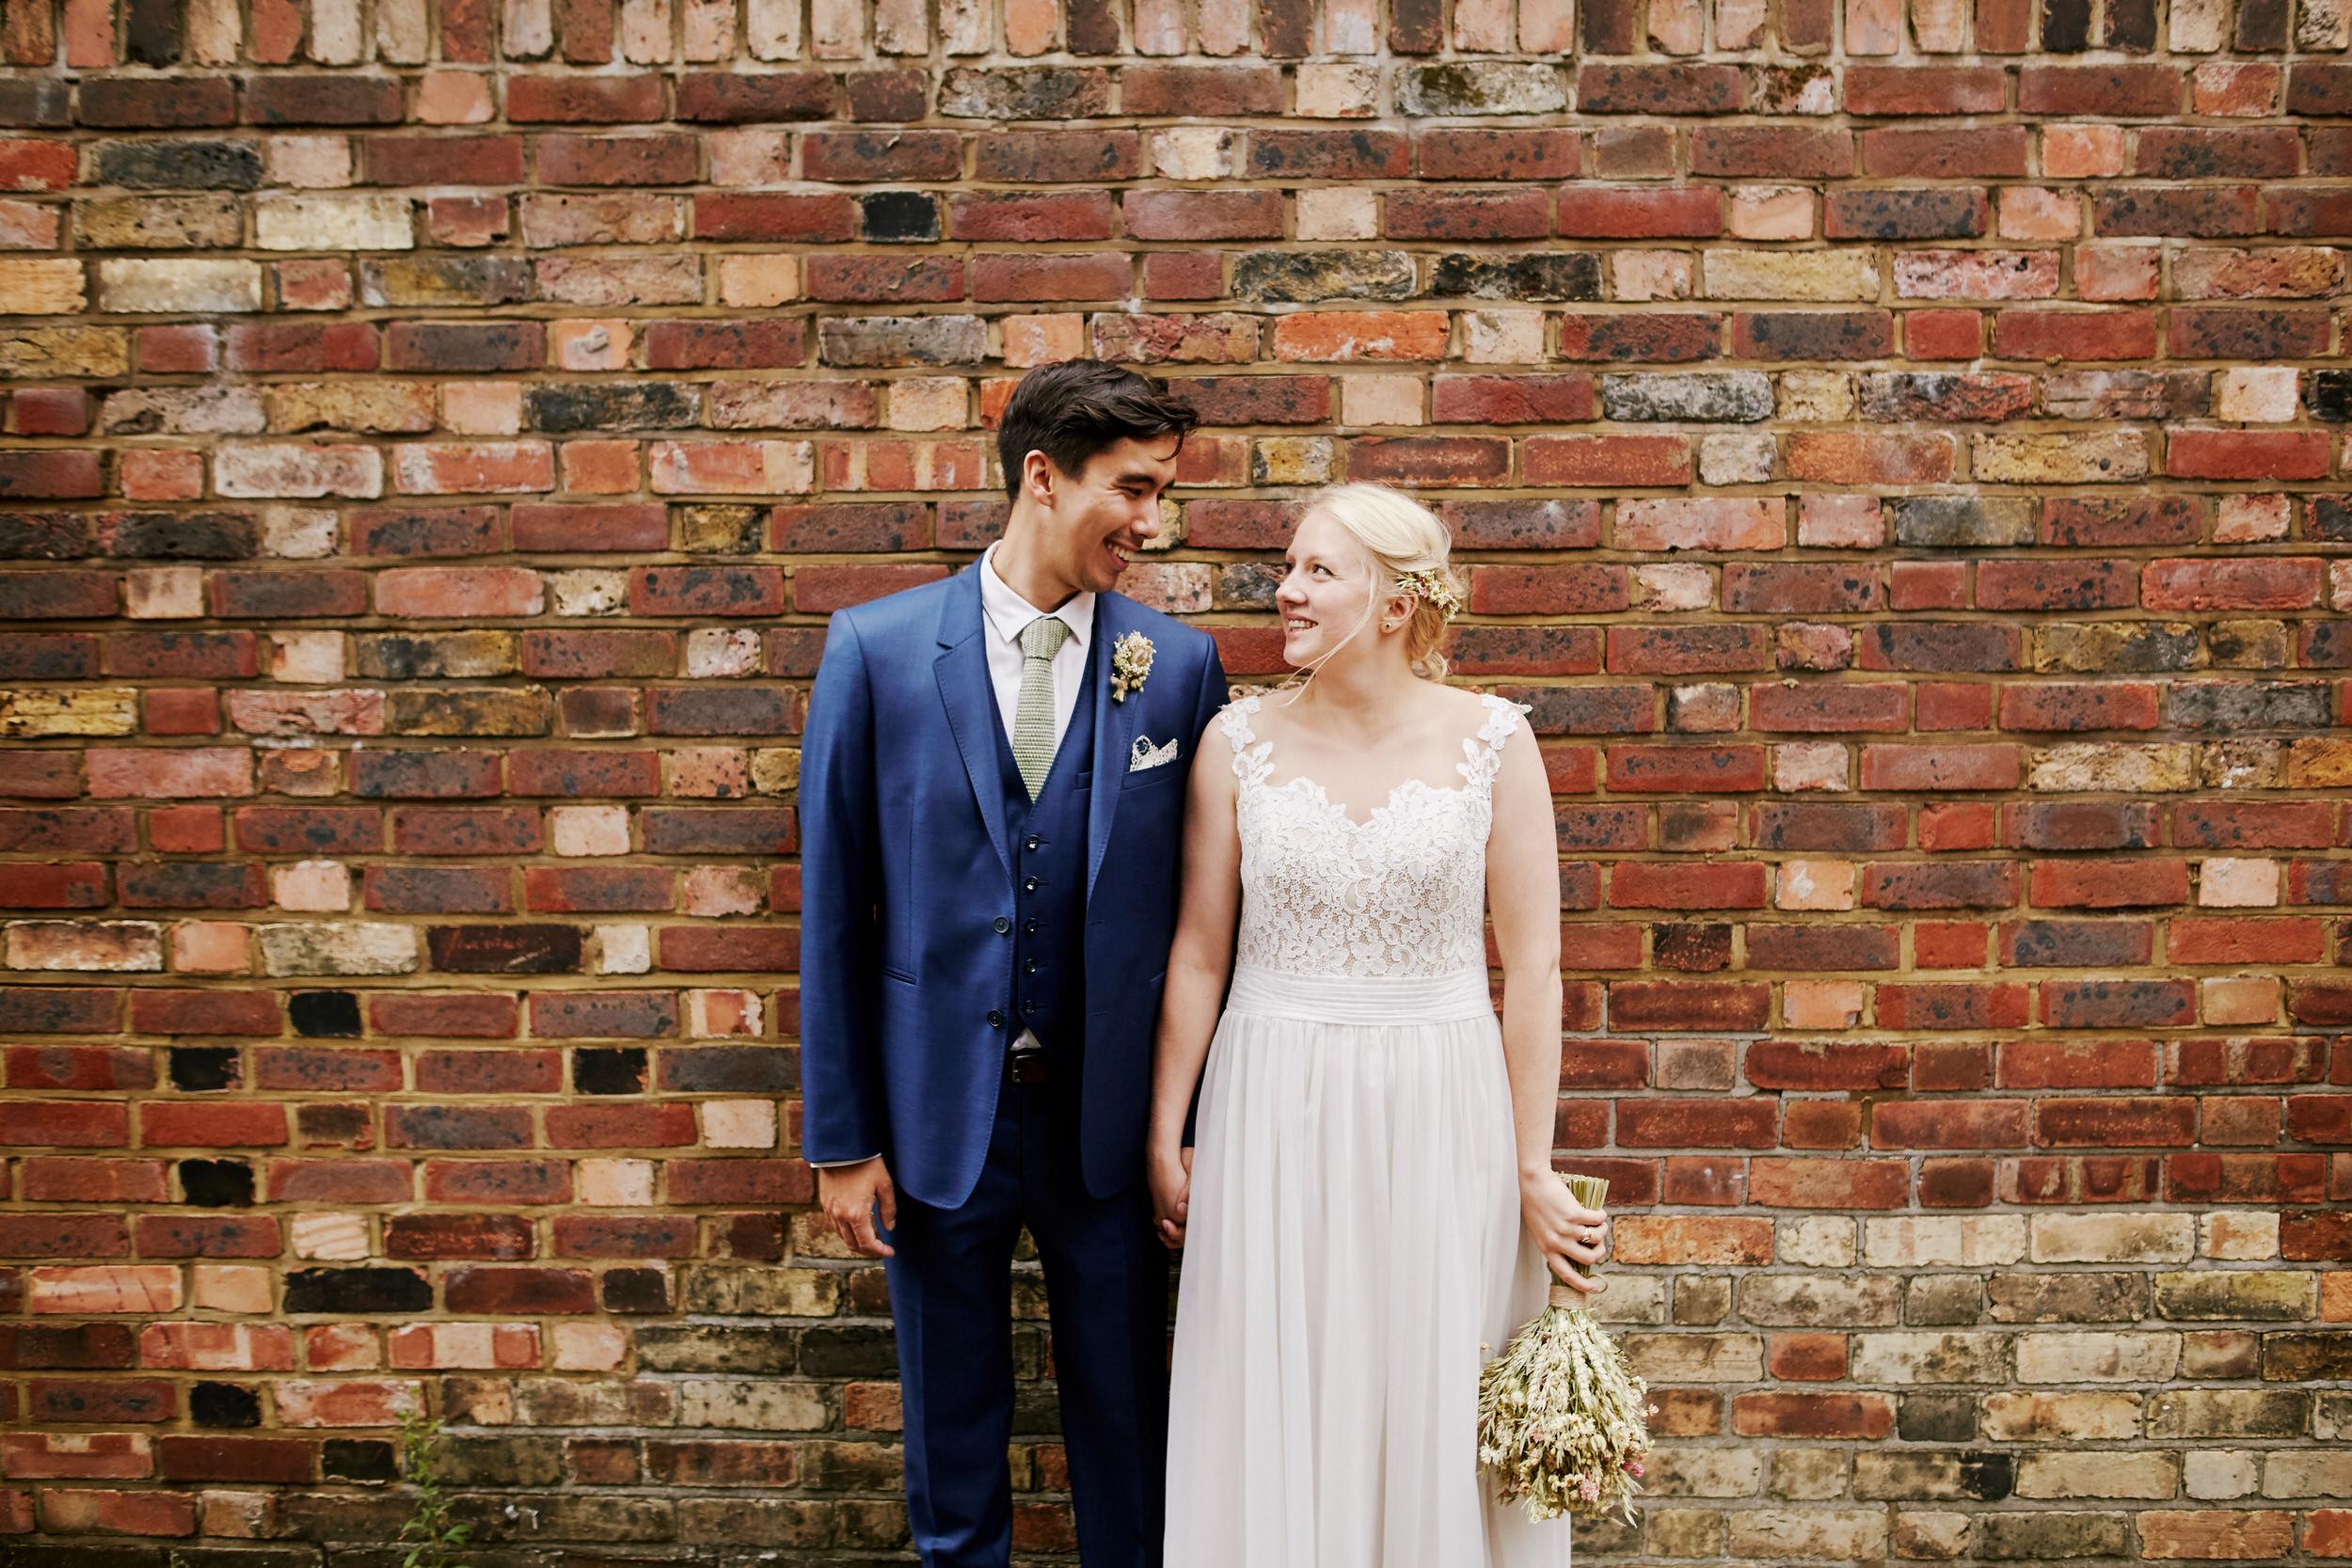 Wedding in London - Echoes & Wild Hearts 0025.jpg